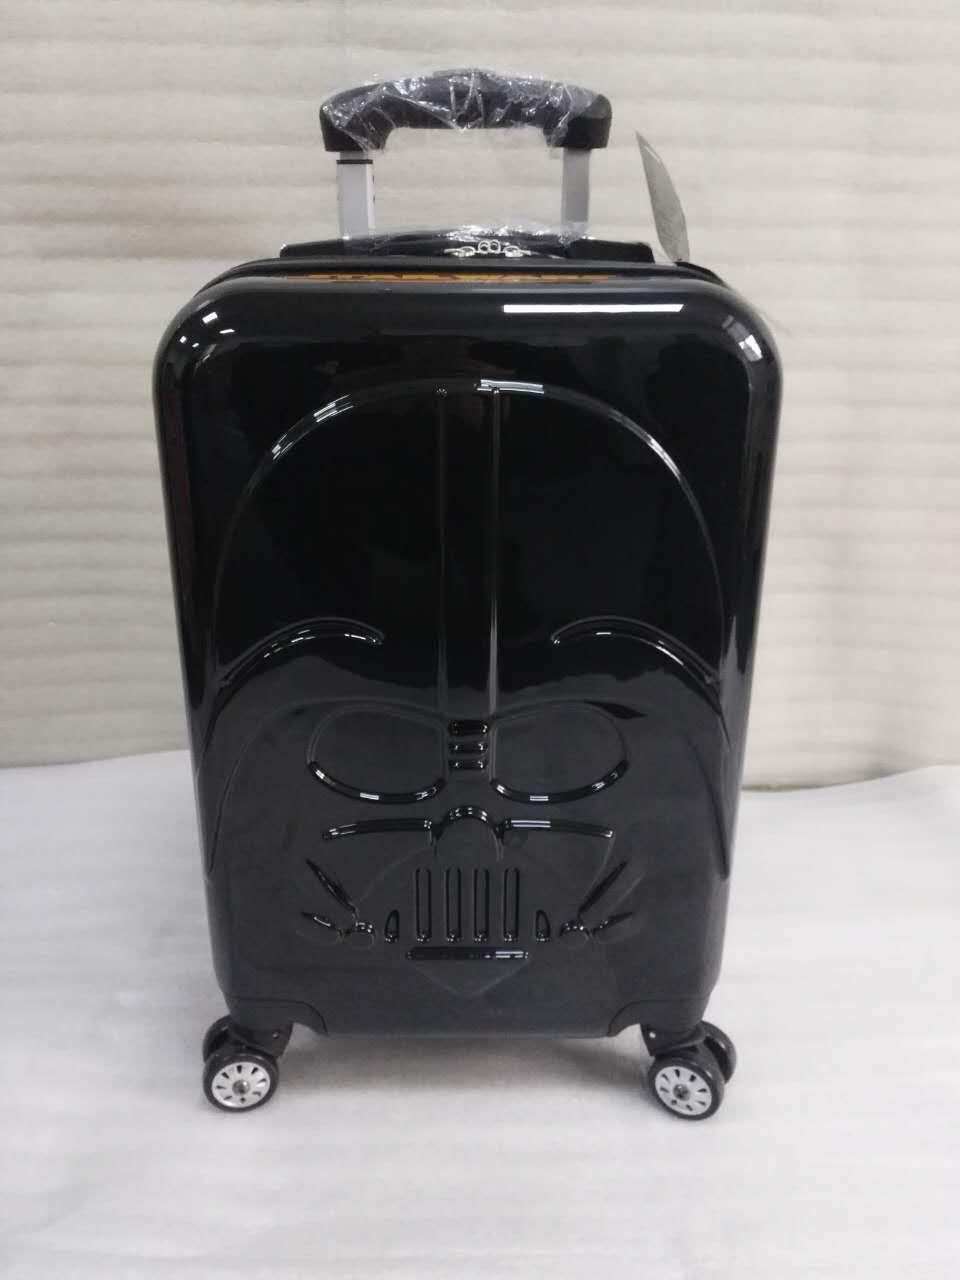 Star Wars Dark Warrior Rolling Luggage Spinner High quality brand Travel Suitcase